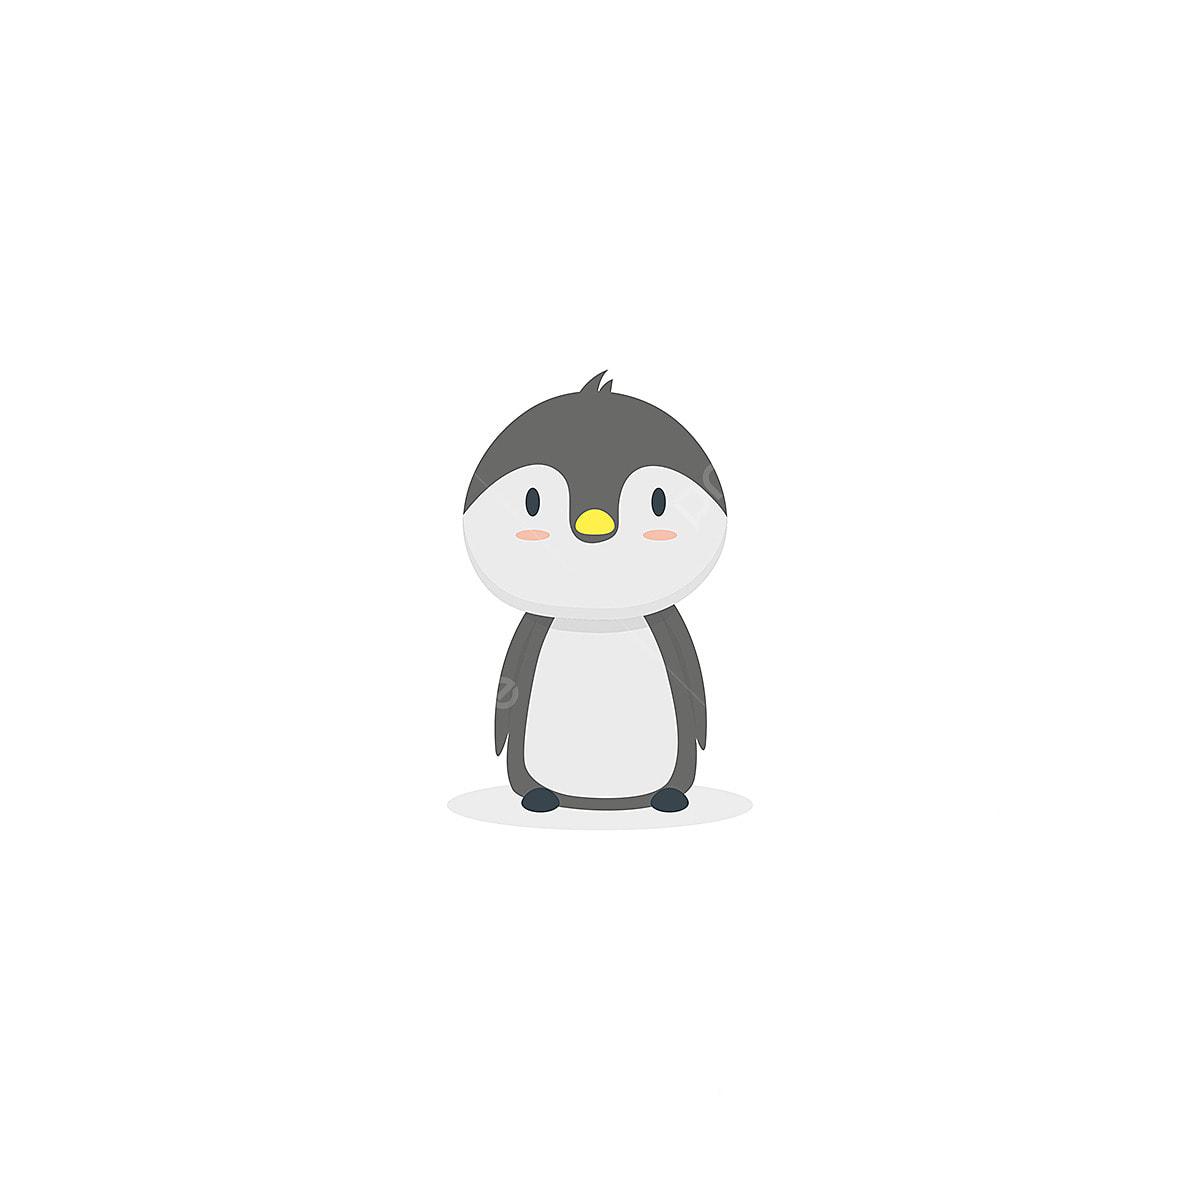 Penguin svg baby penguin svg file mom and baby svg png jpg | Etsy